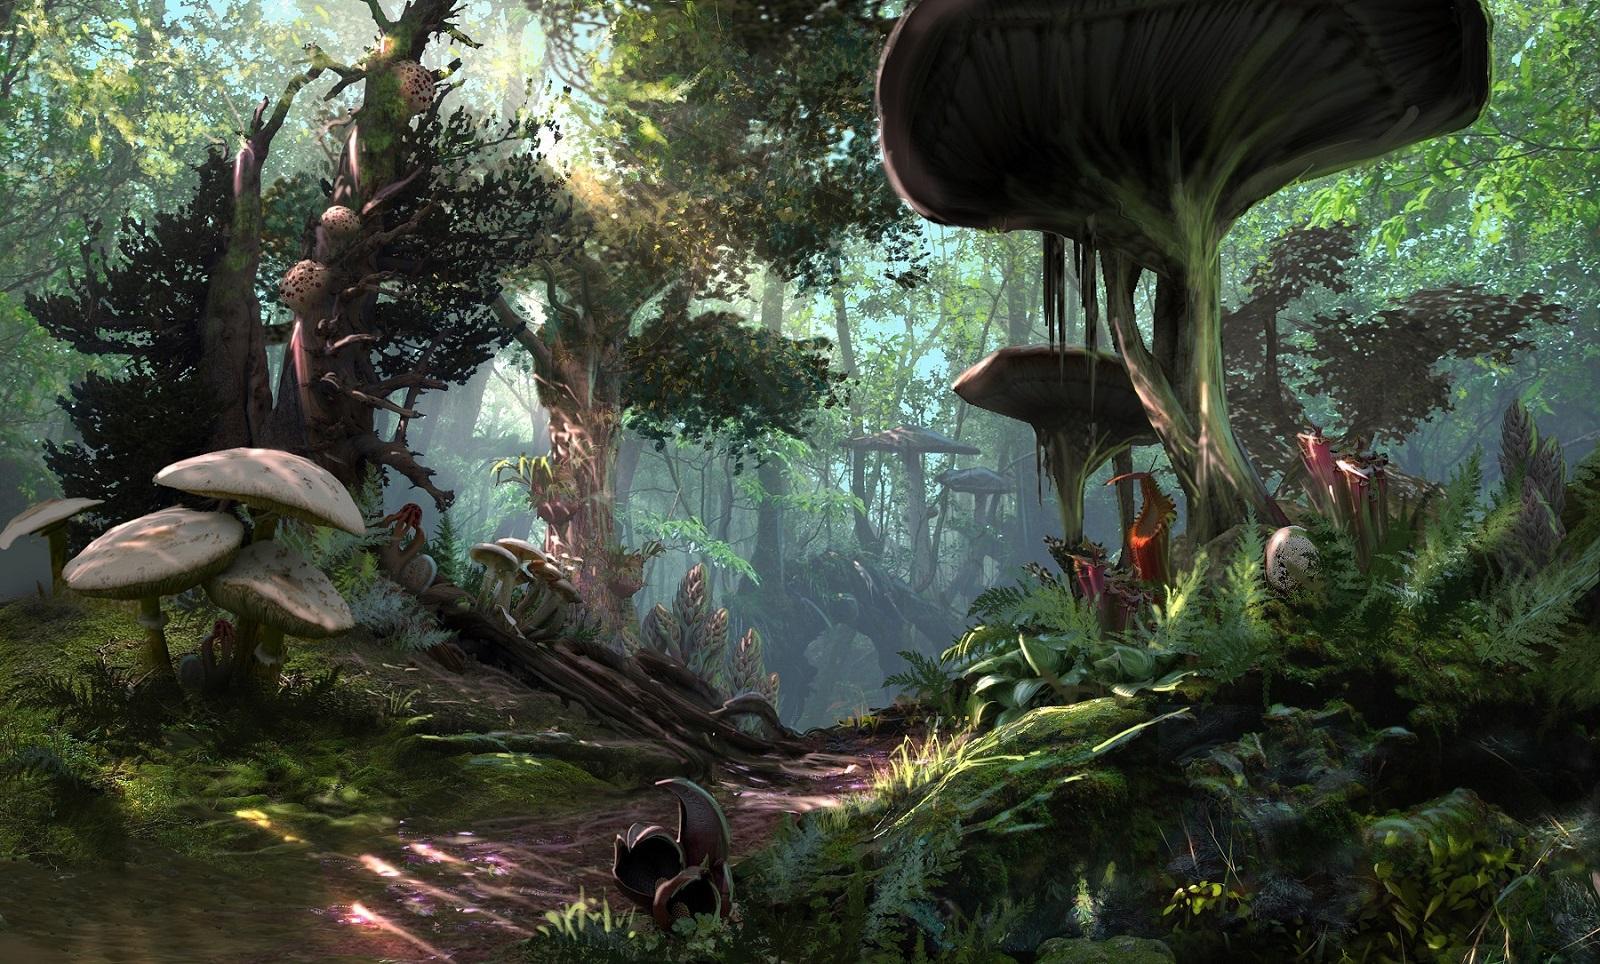 Elder Scrolls Online Runs At 4K30FPS On XB1X With